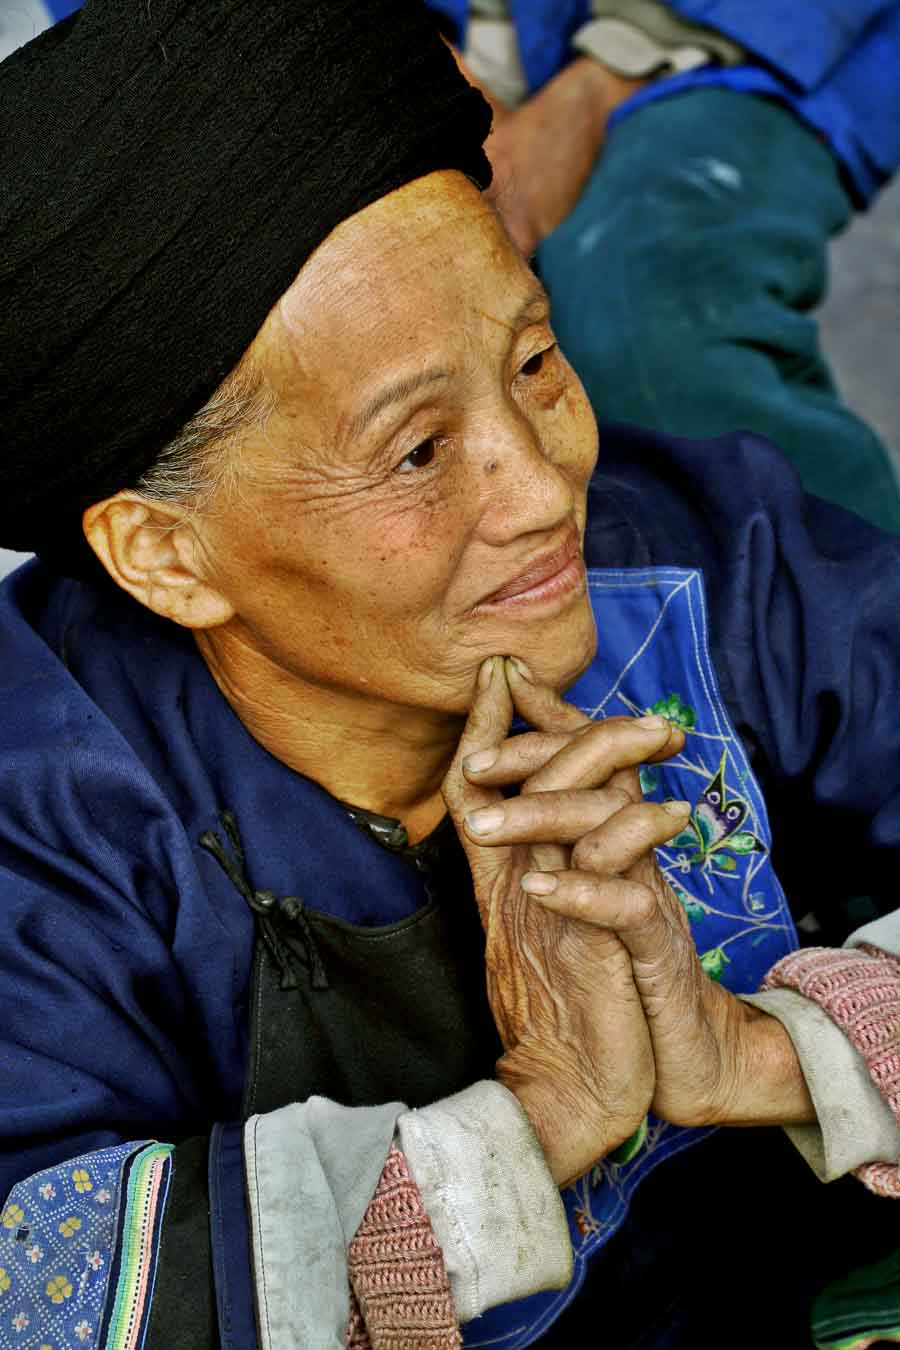 Elder during work with pyracantha. Horseneck, China.